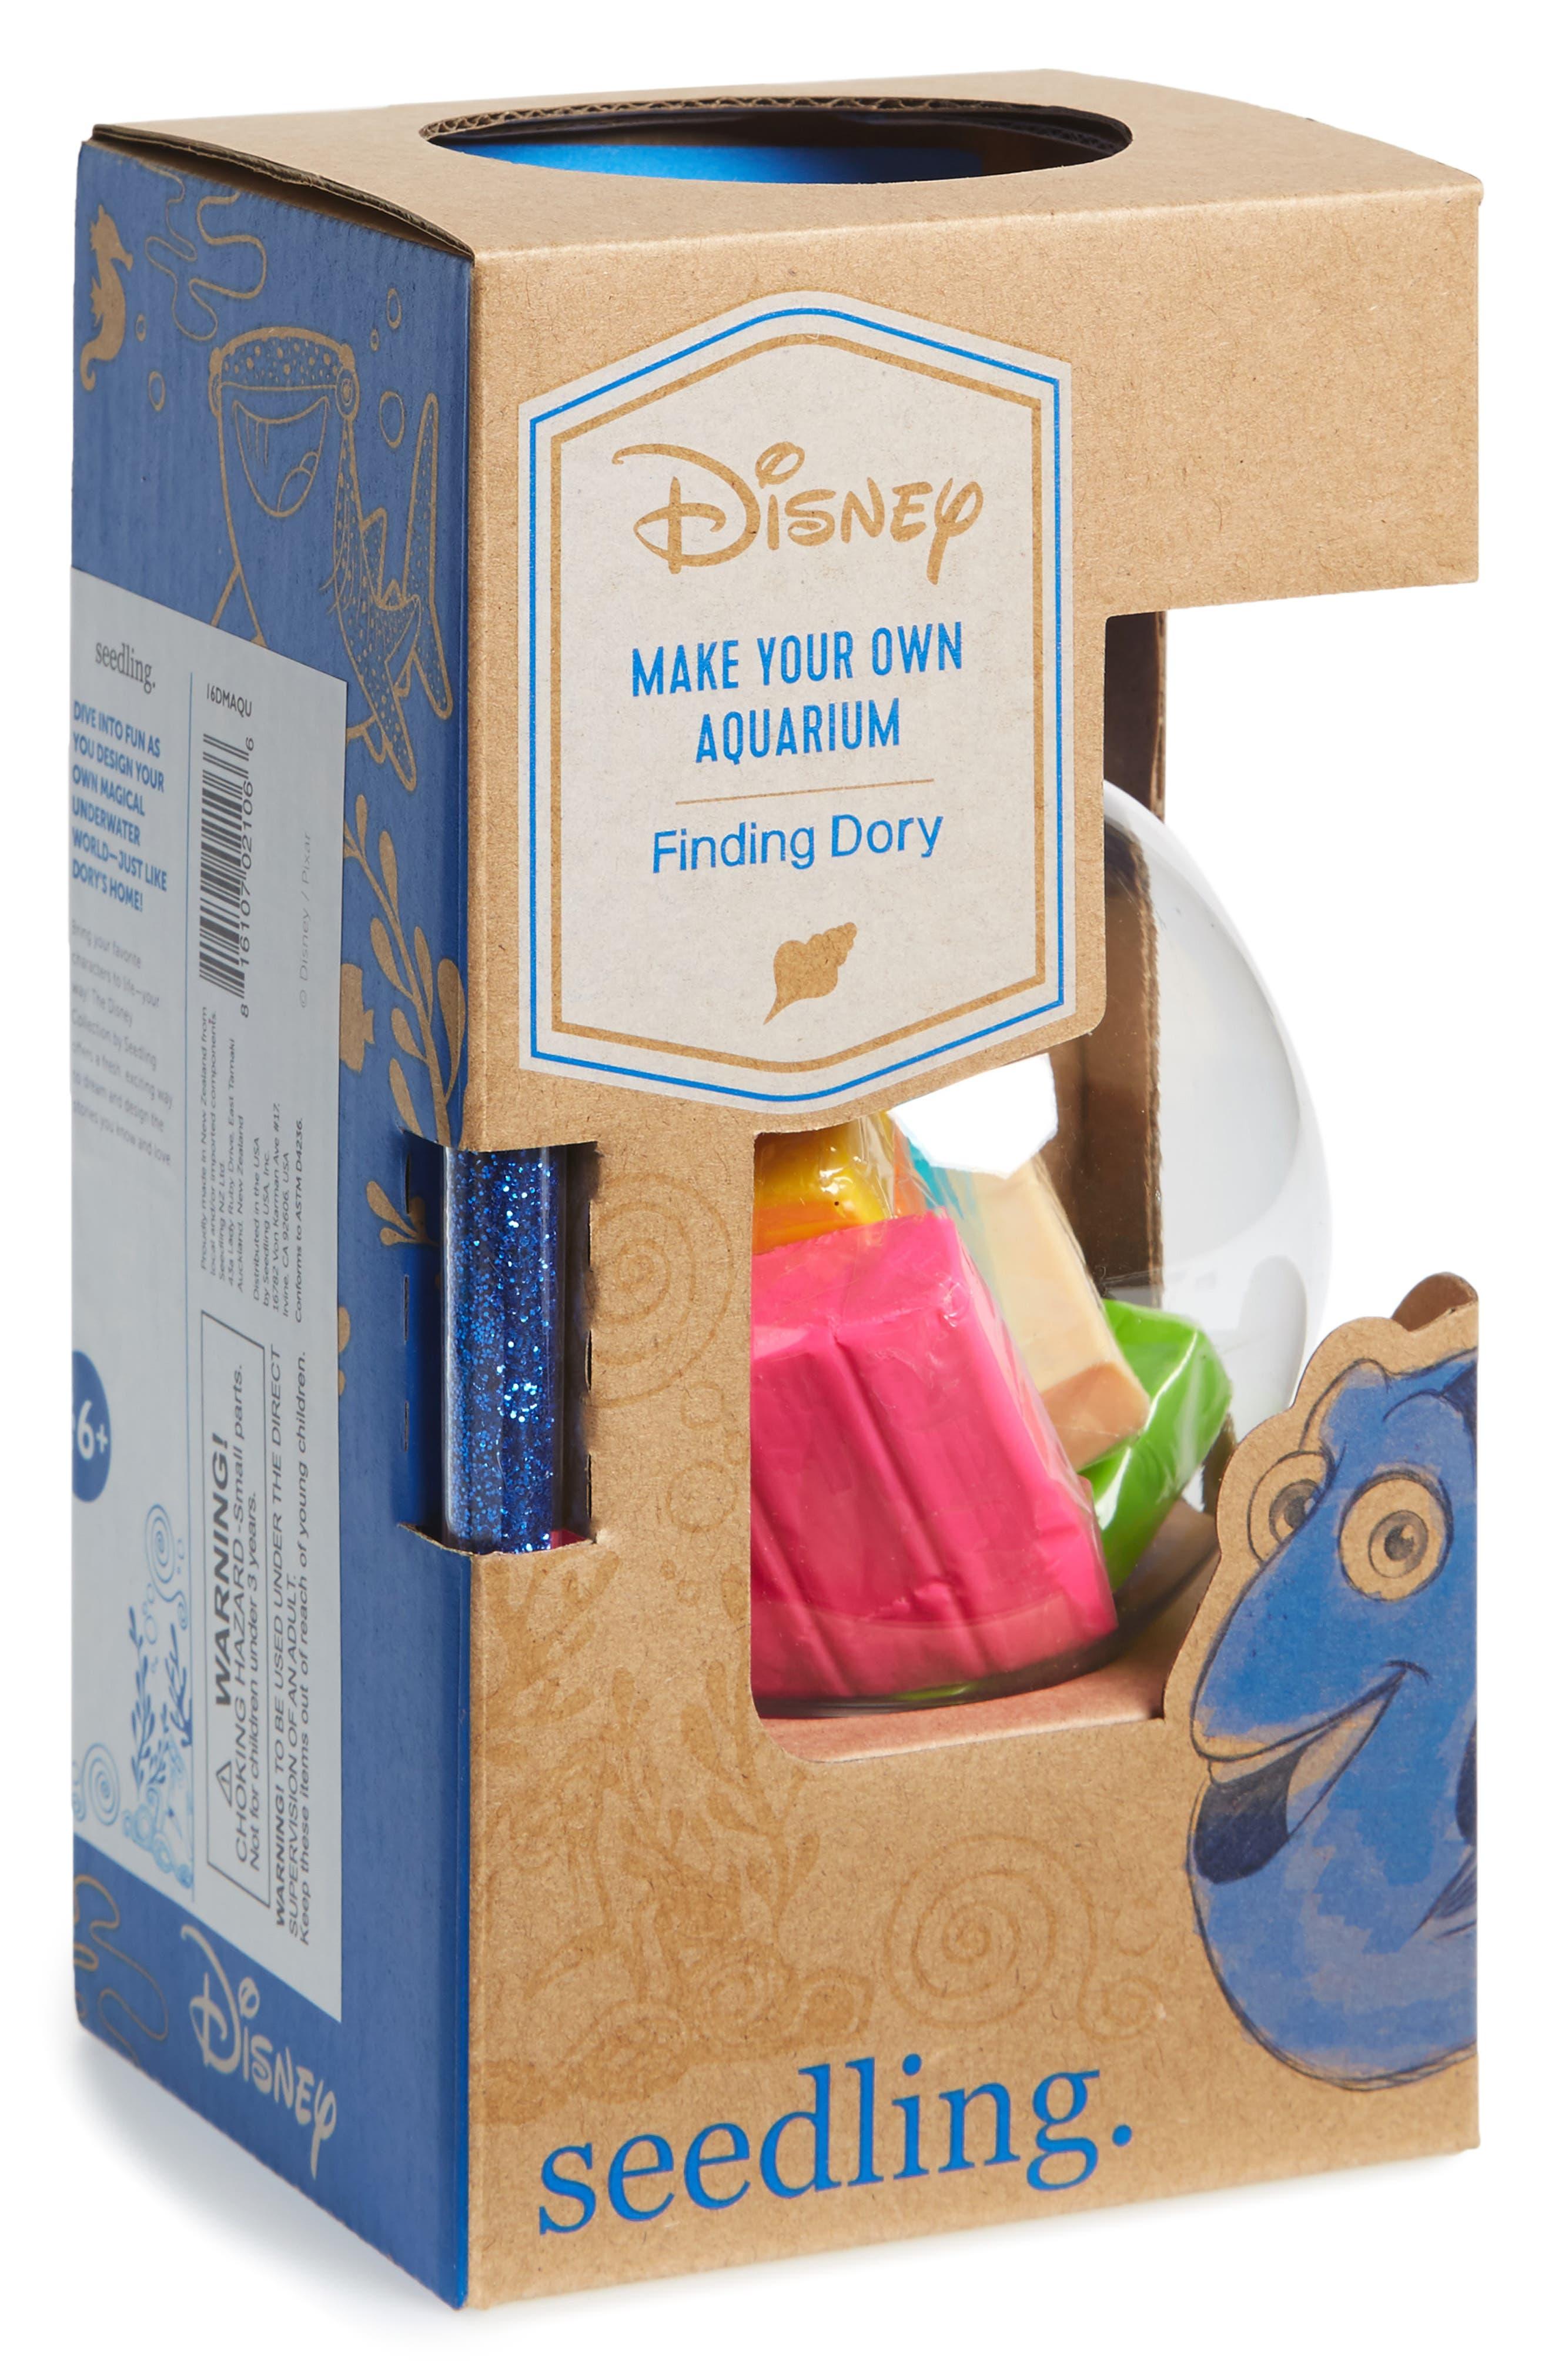 SEEDLING, Disney Finding Dory Make Your Own Aquarium Craft Kit, Main thumbnail 1, color, 250